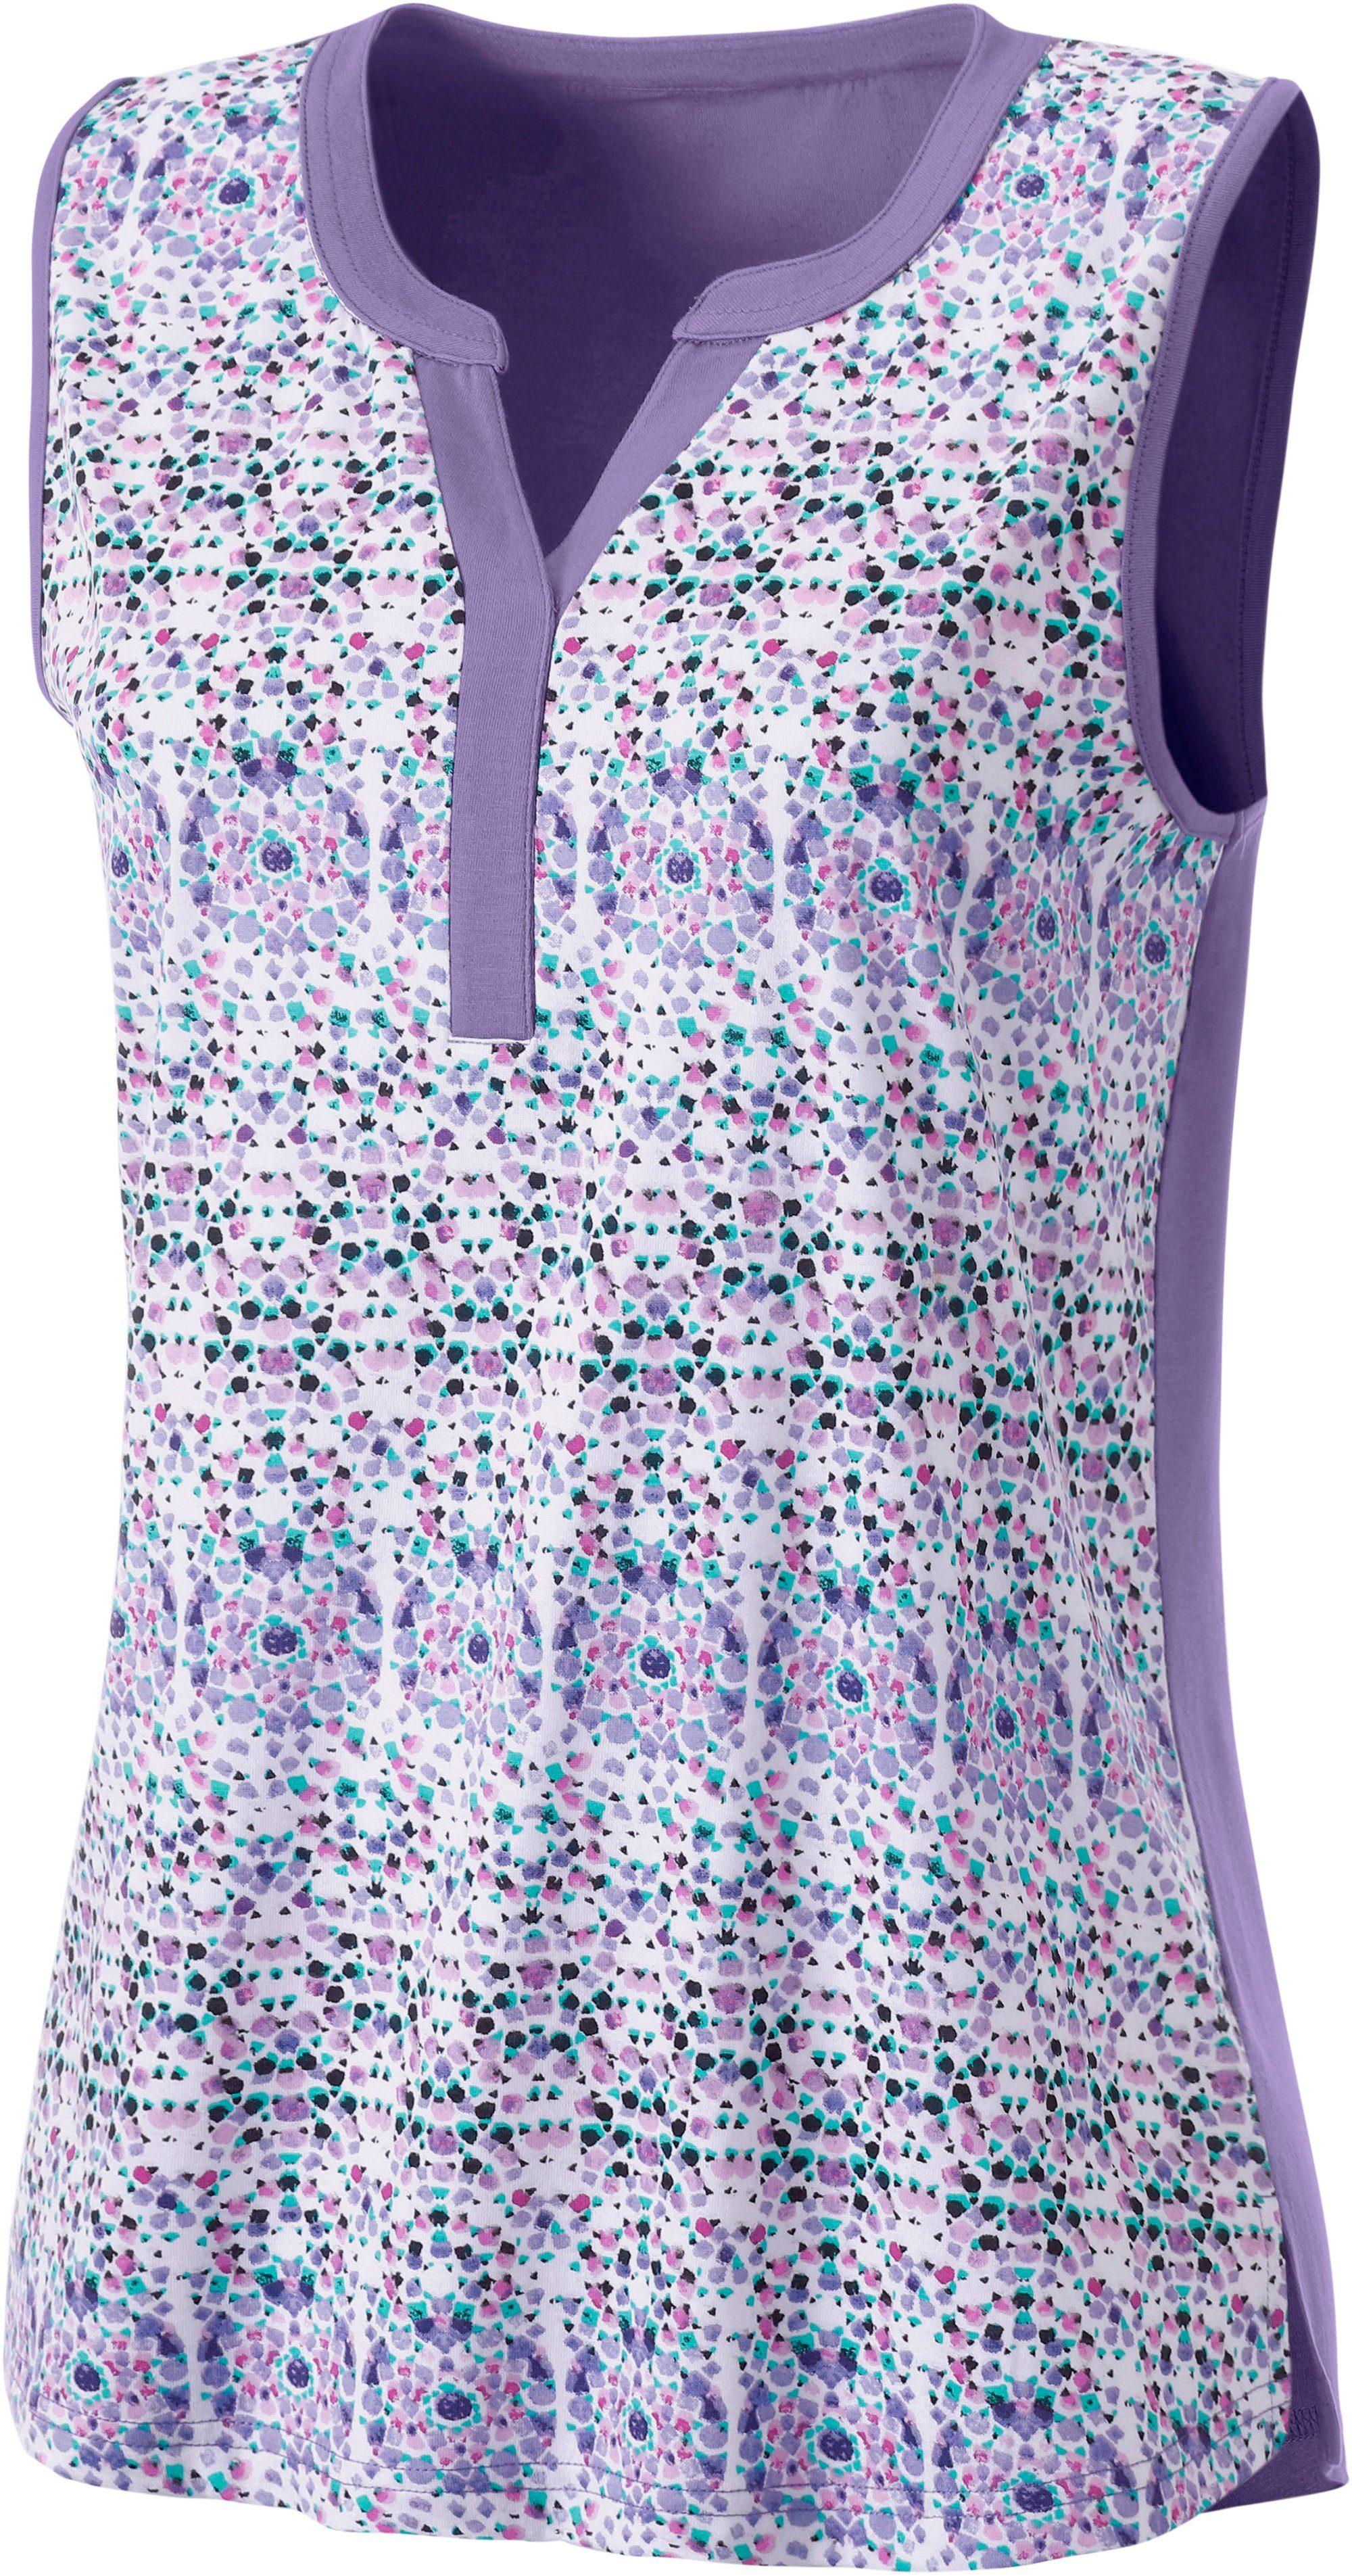 Classic Basics Shirttop In Zachte Katoen-modalmix Makkelijk Besteld - Geweldige Prijs